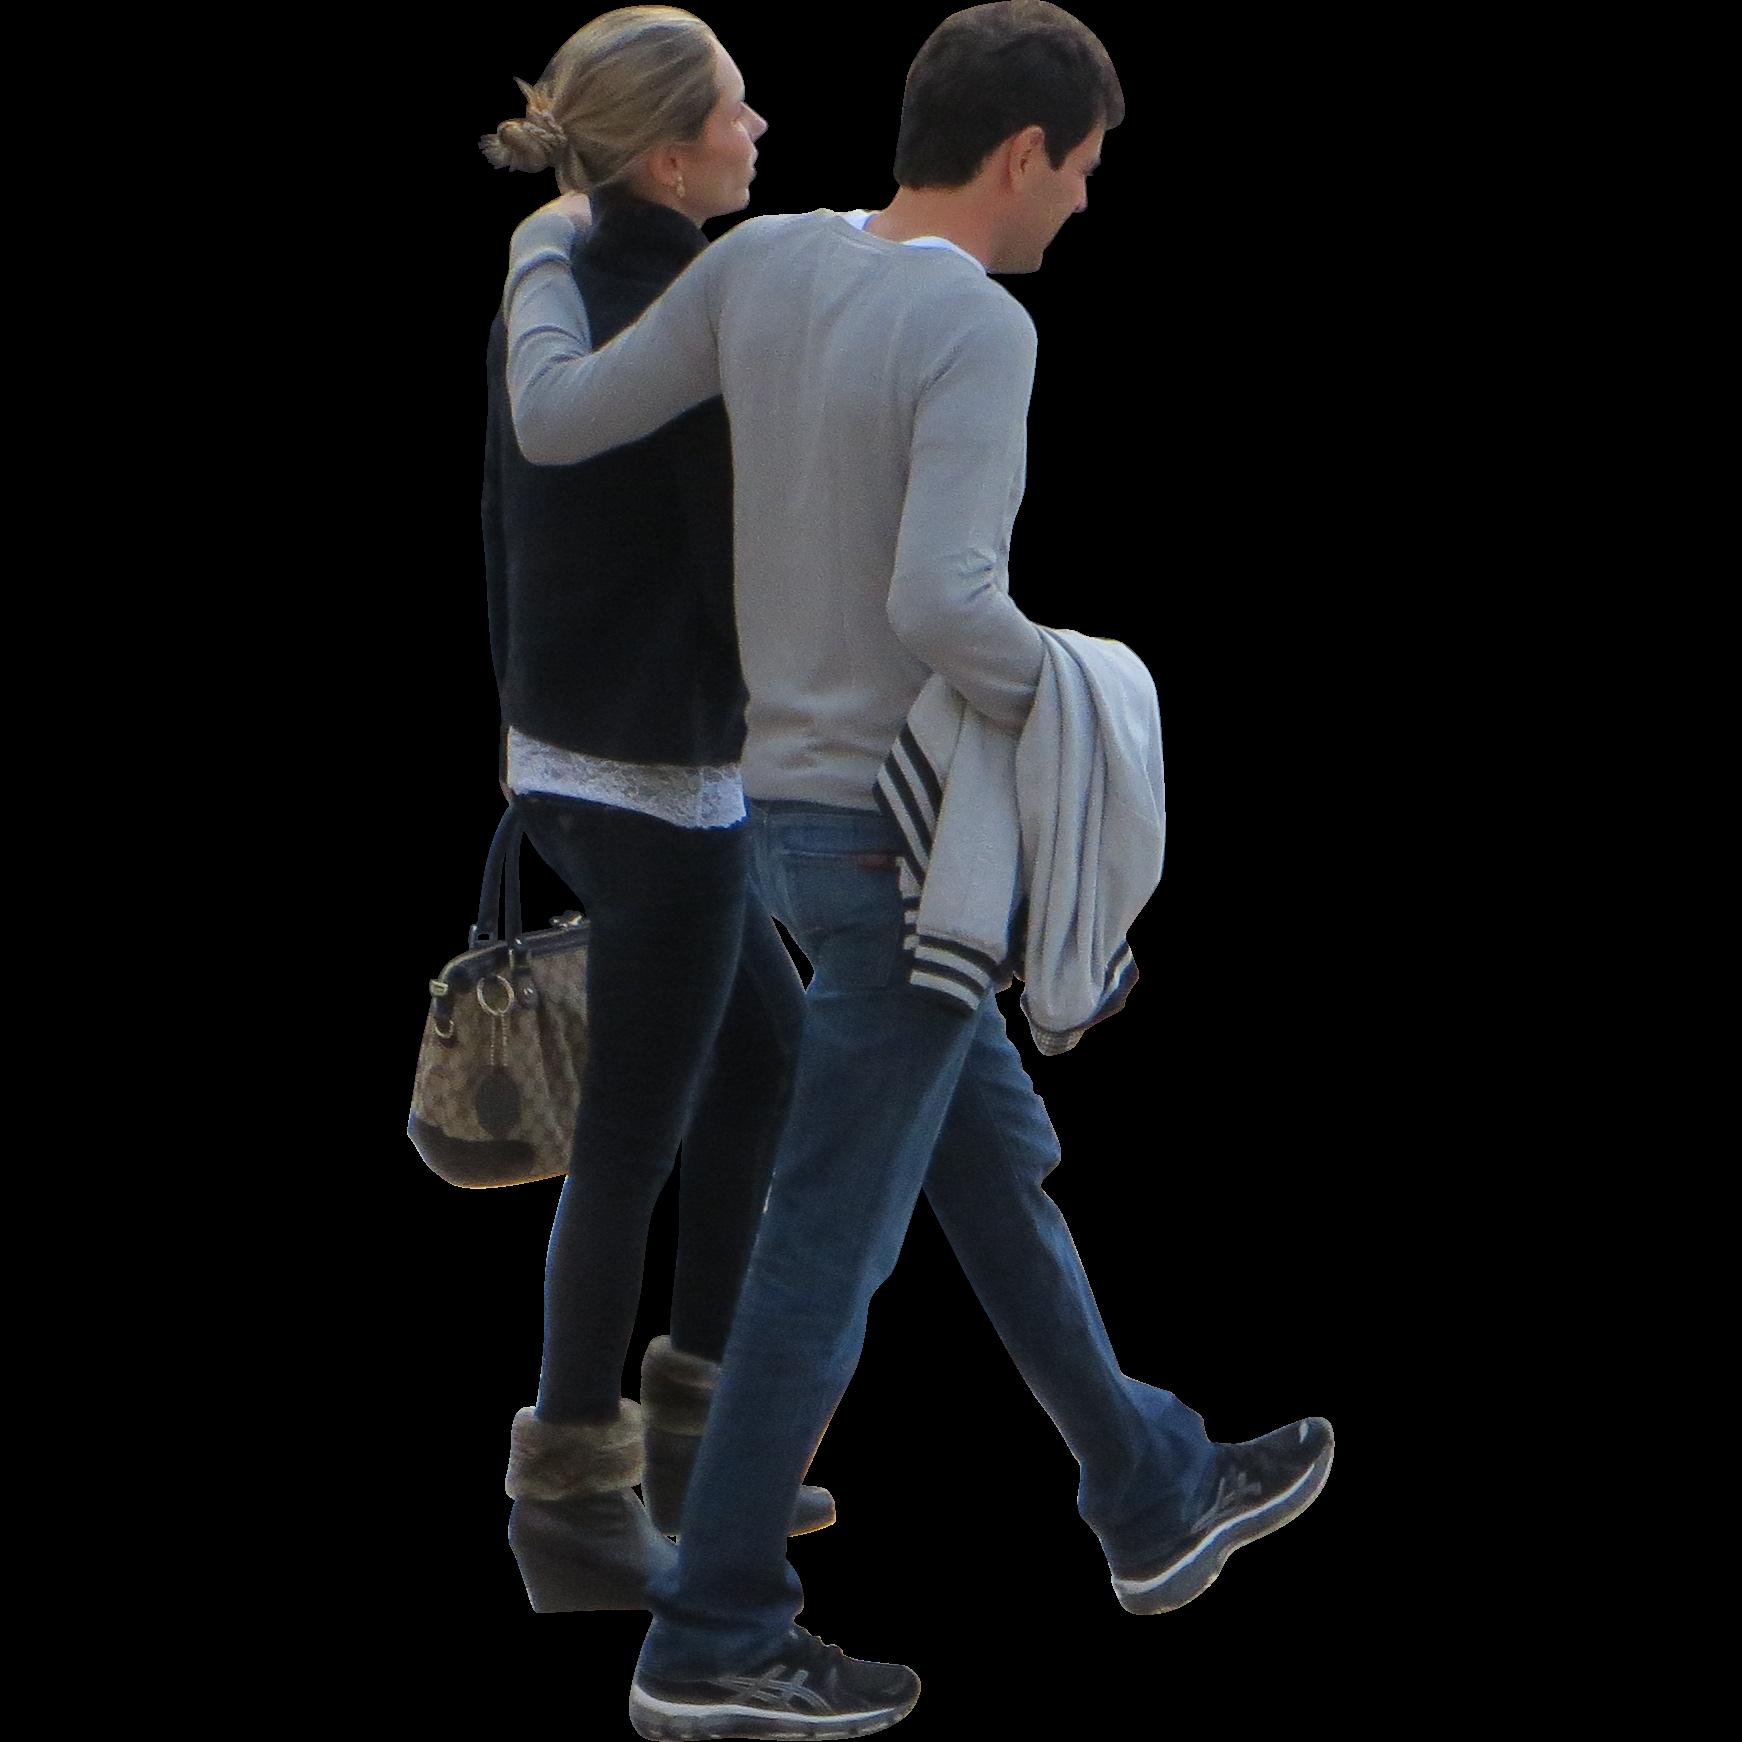 walking people png - Google Search | png-people ...